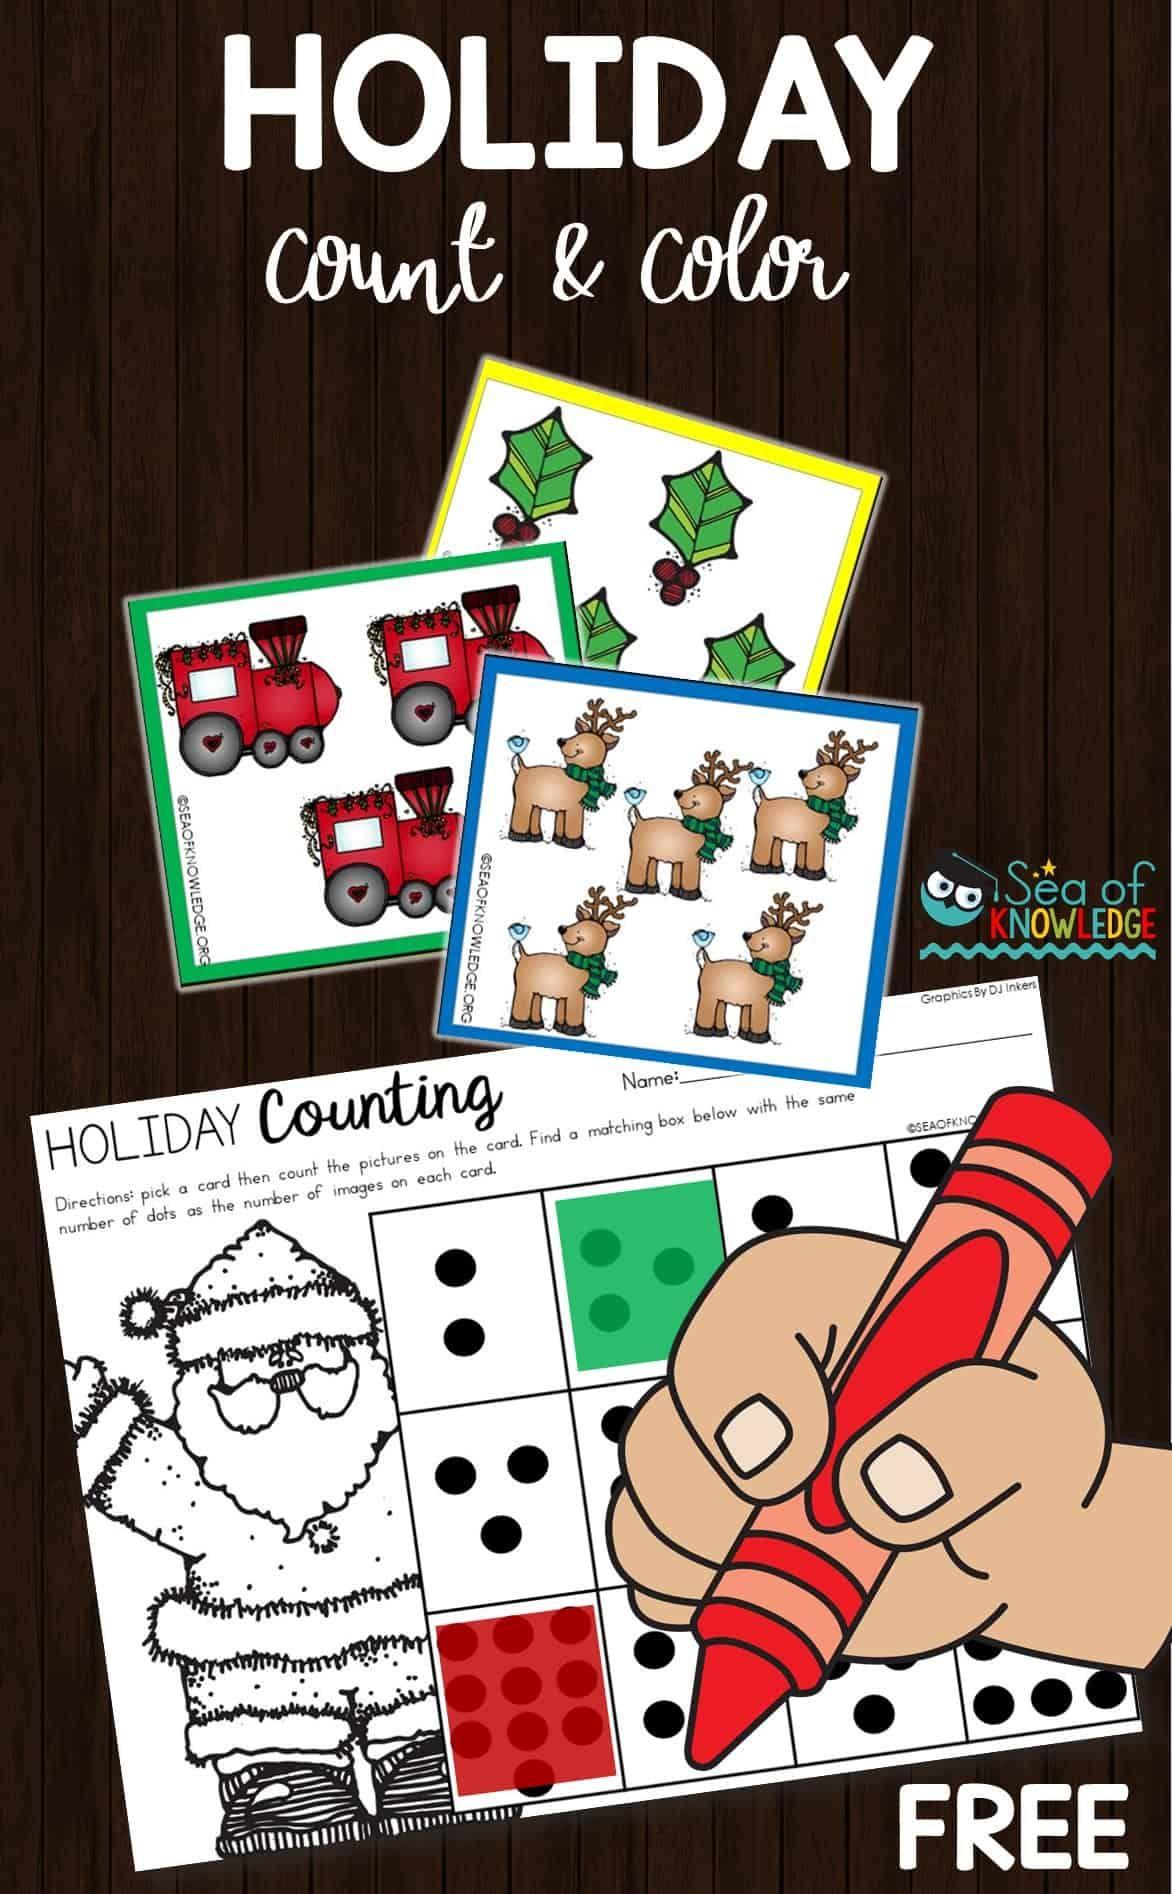 12 Days Of Christmas Number Recognition Worksheet Number Recognition Worksheets Christmas Worksheets 12 Days Of Christmas [ 3300 x 2550 Pixel ]